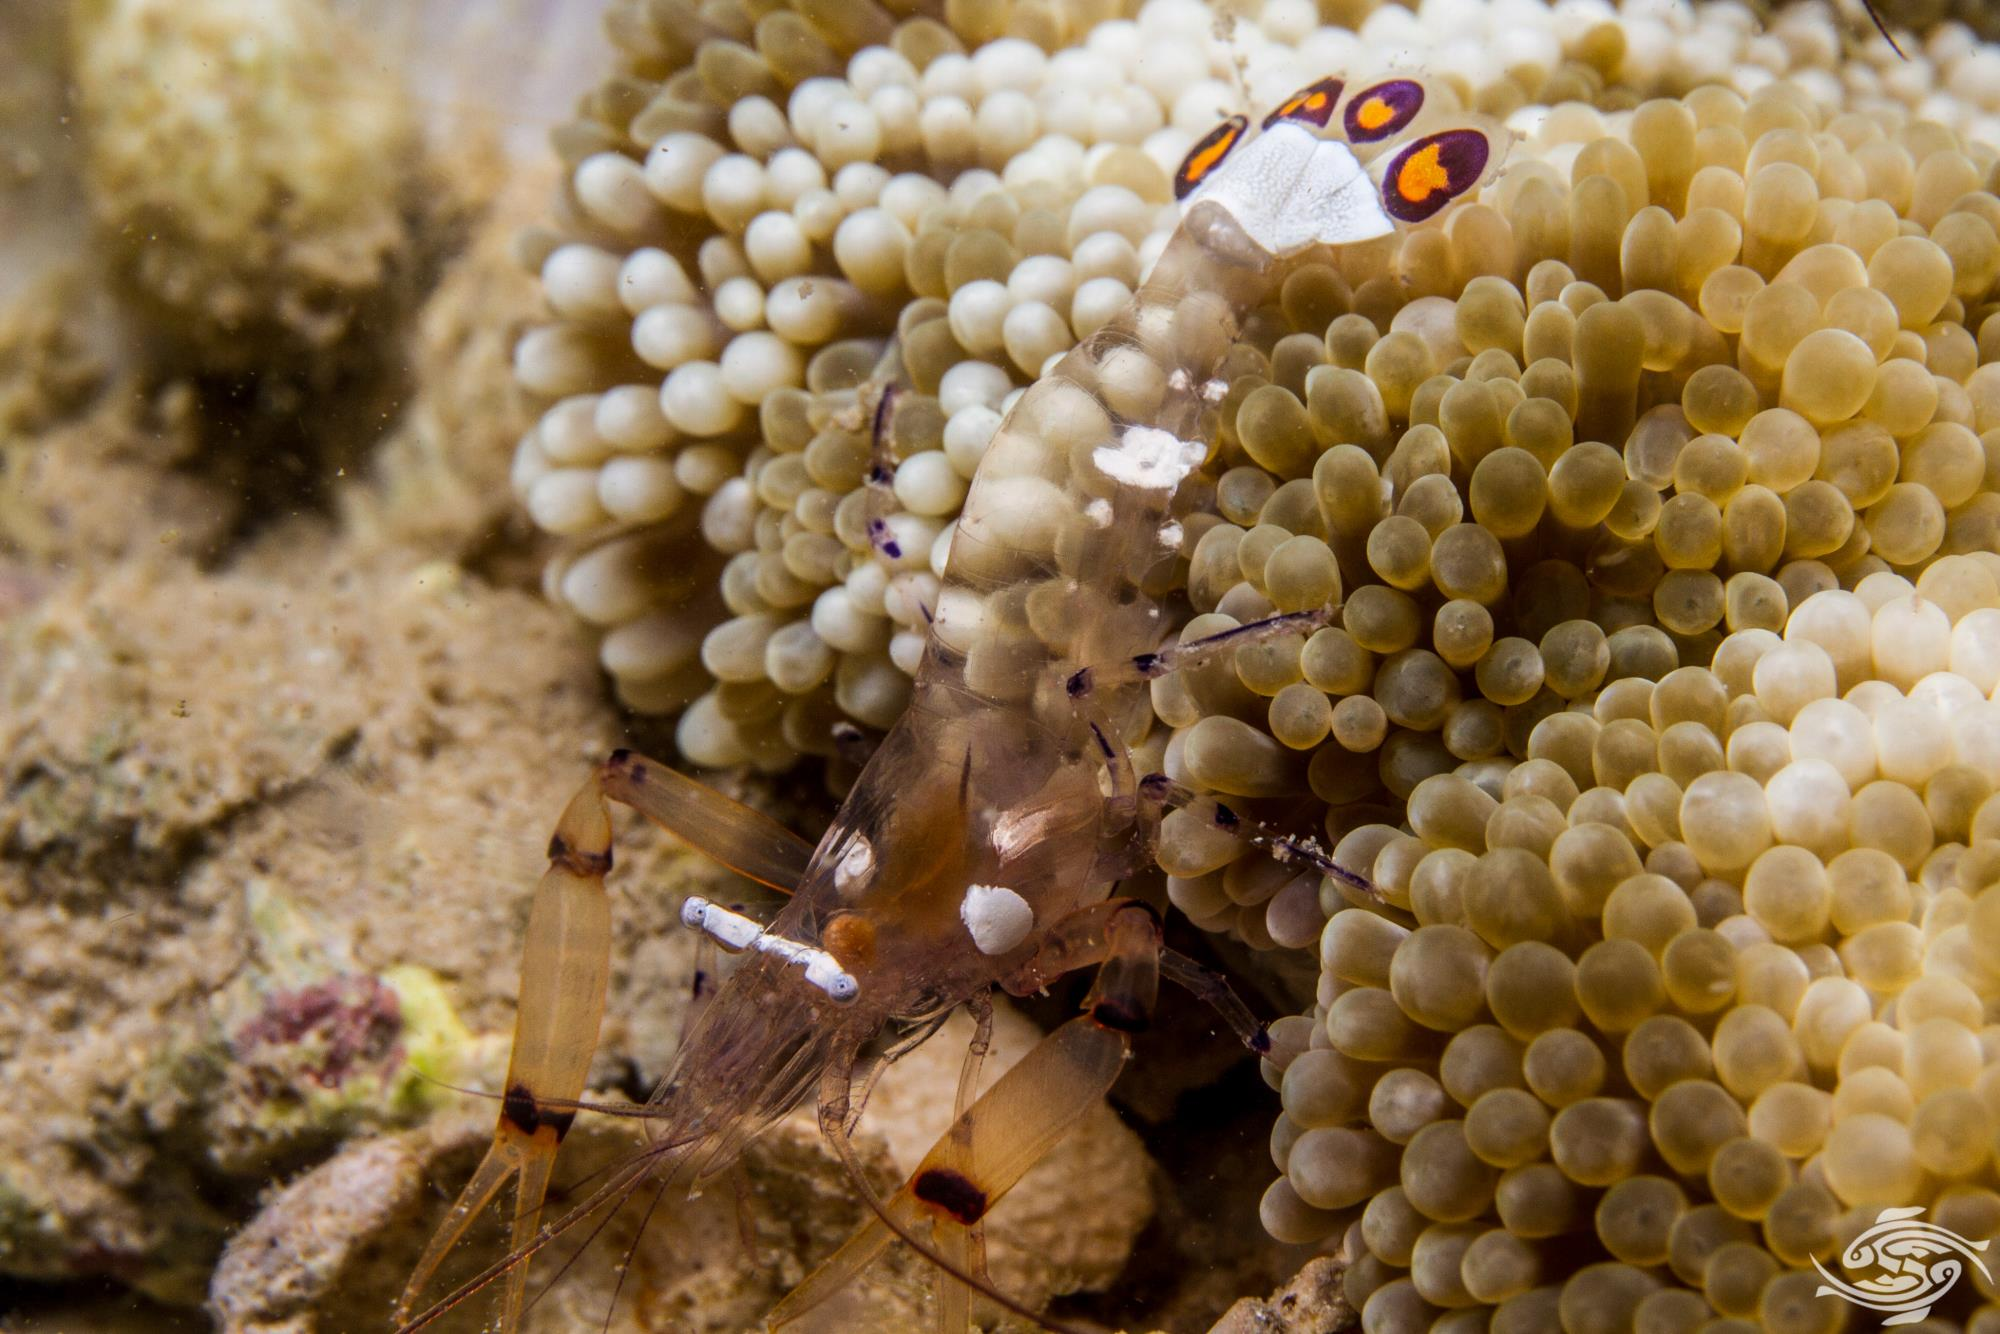 Periclimenes brevicarpalis Pacific Clown Anemone Shrimp, White Spot anemone shrimp, Glass Amenone Shrimp, Peacock-Tail Anemone Shrimp